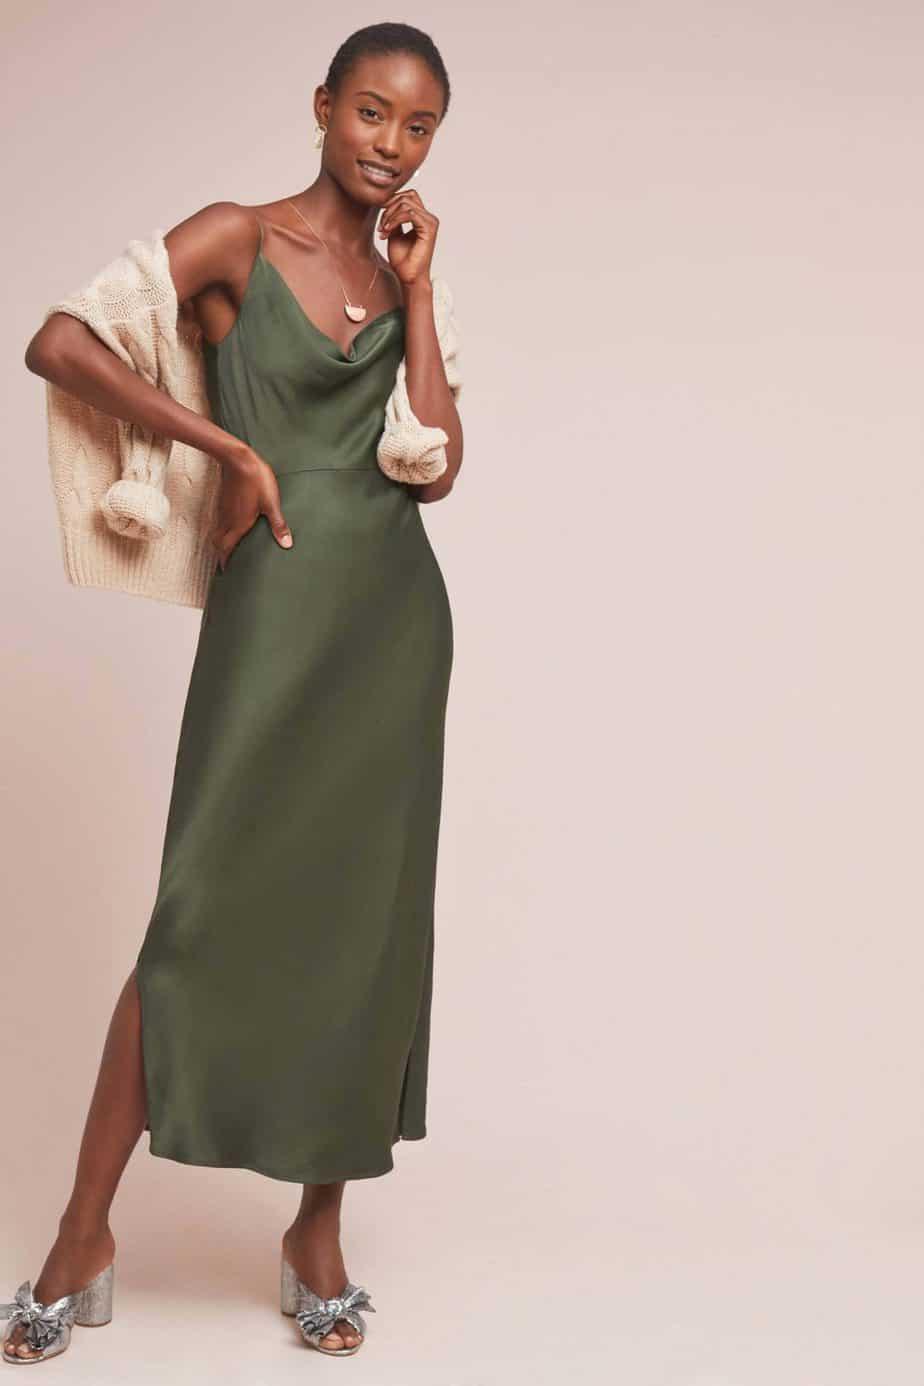 ANTHROPOLOGIE. מחיר שמלה: 439.90 שקל. צילום: יח״צ חו״ל